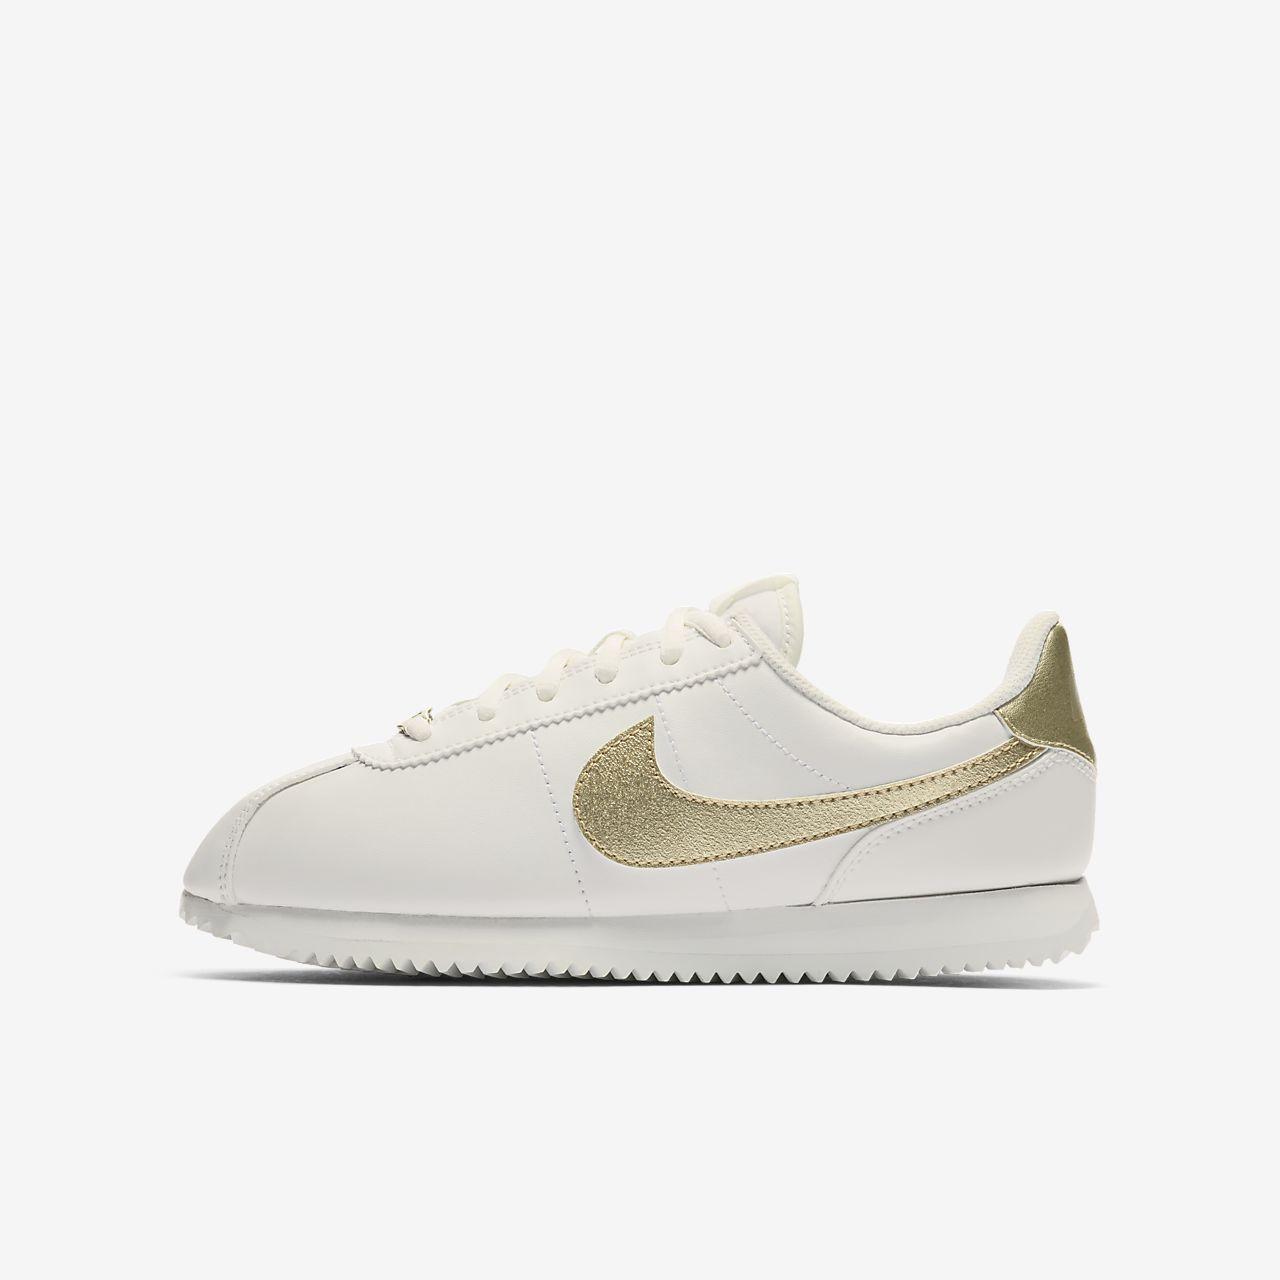 ... Nike Cortez Basic SL Older Kids' Shoe